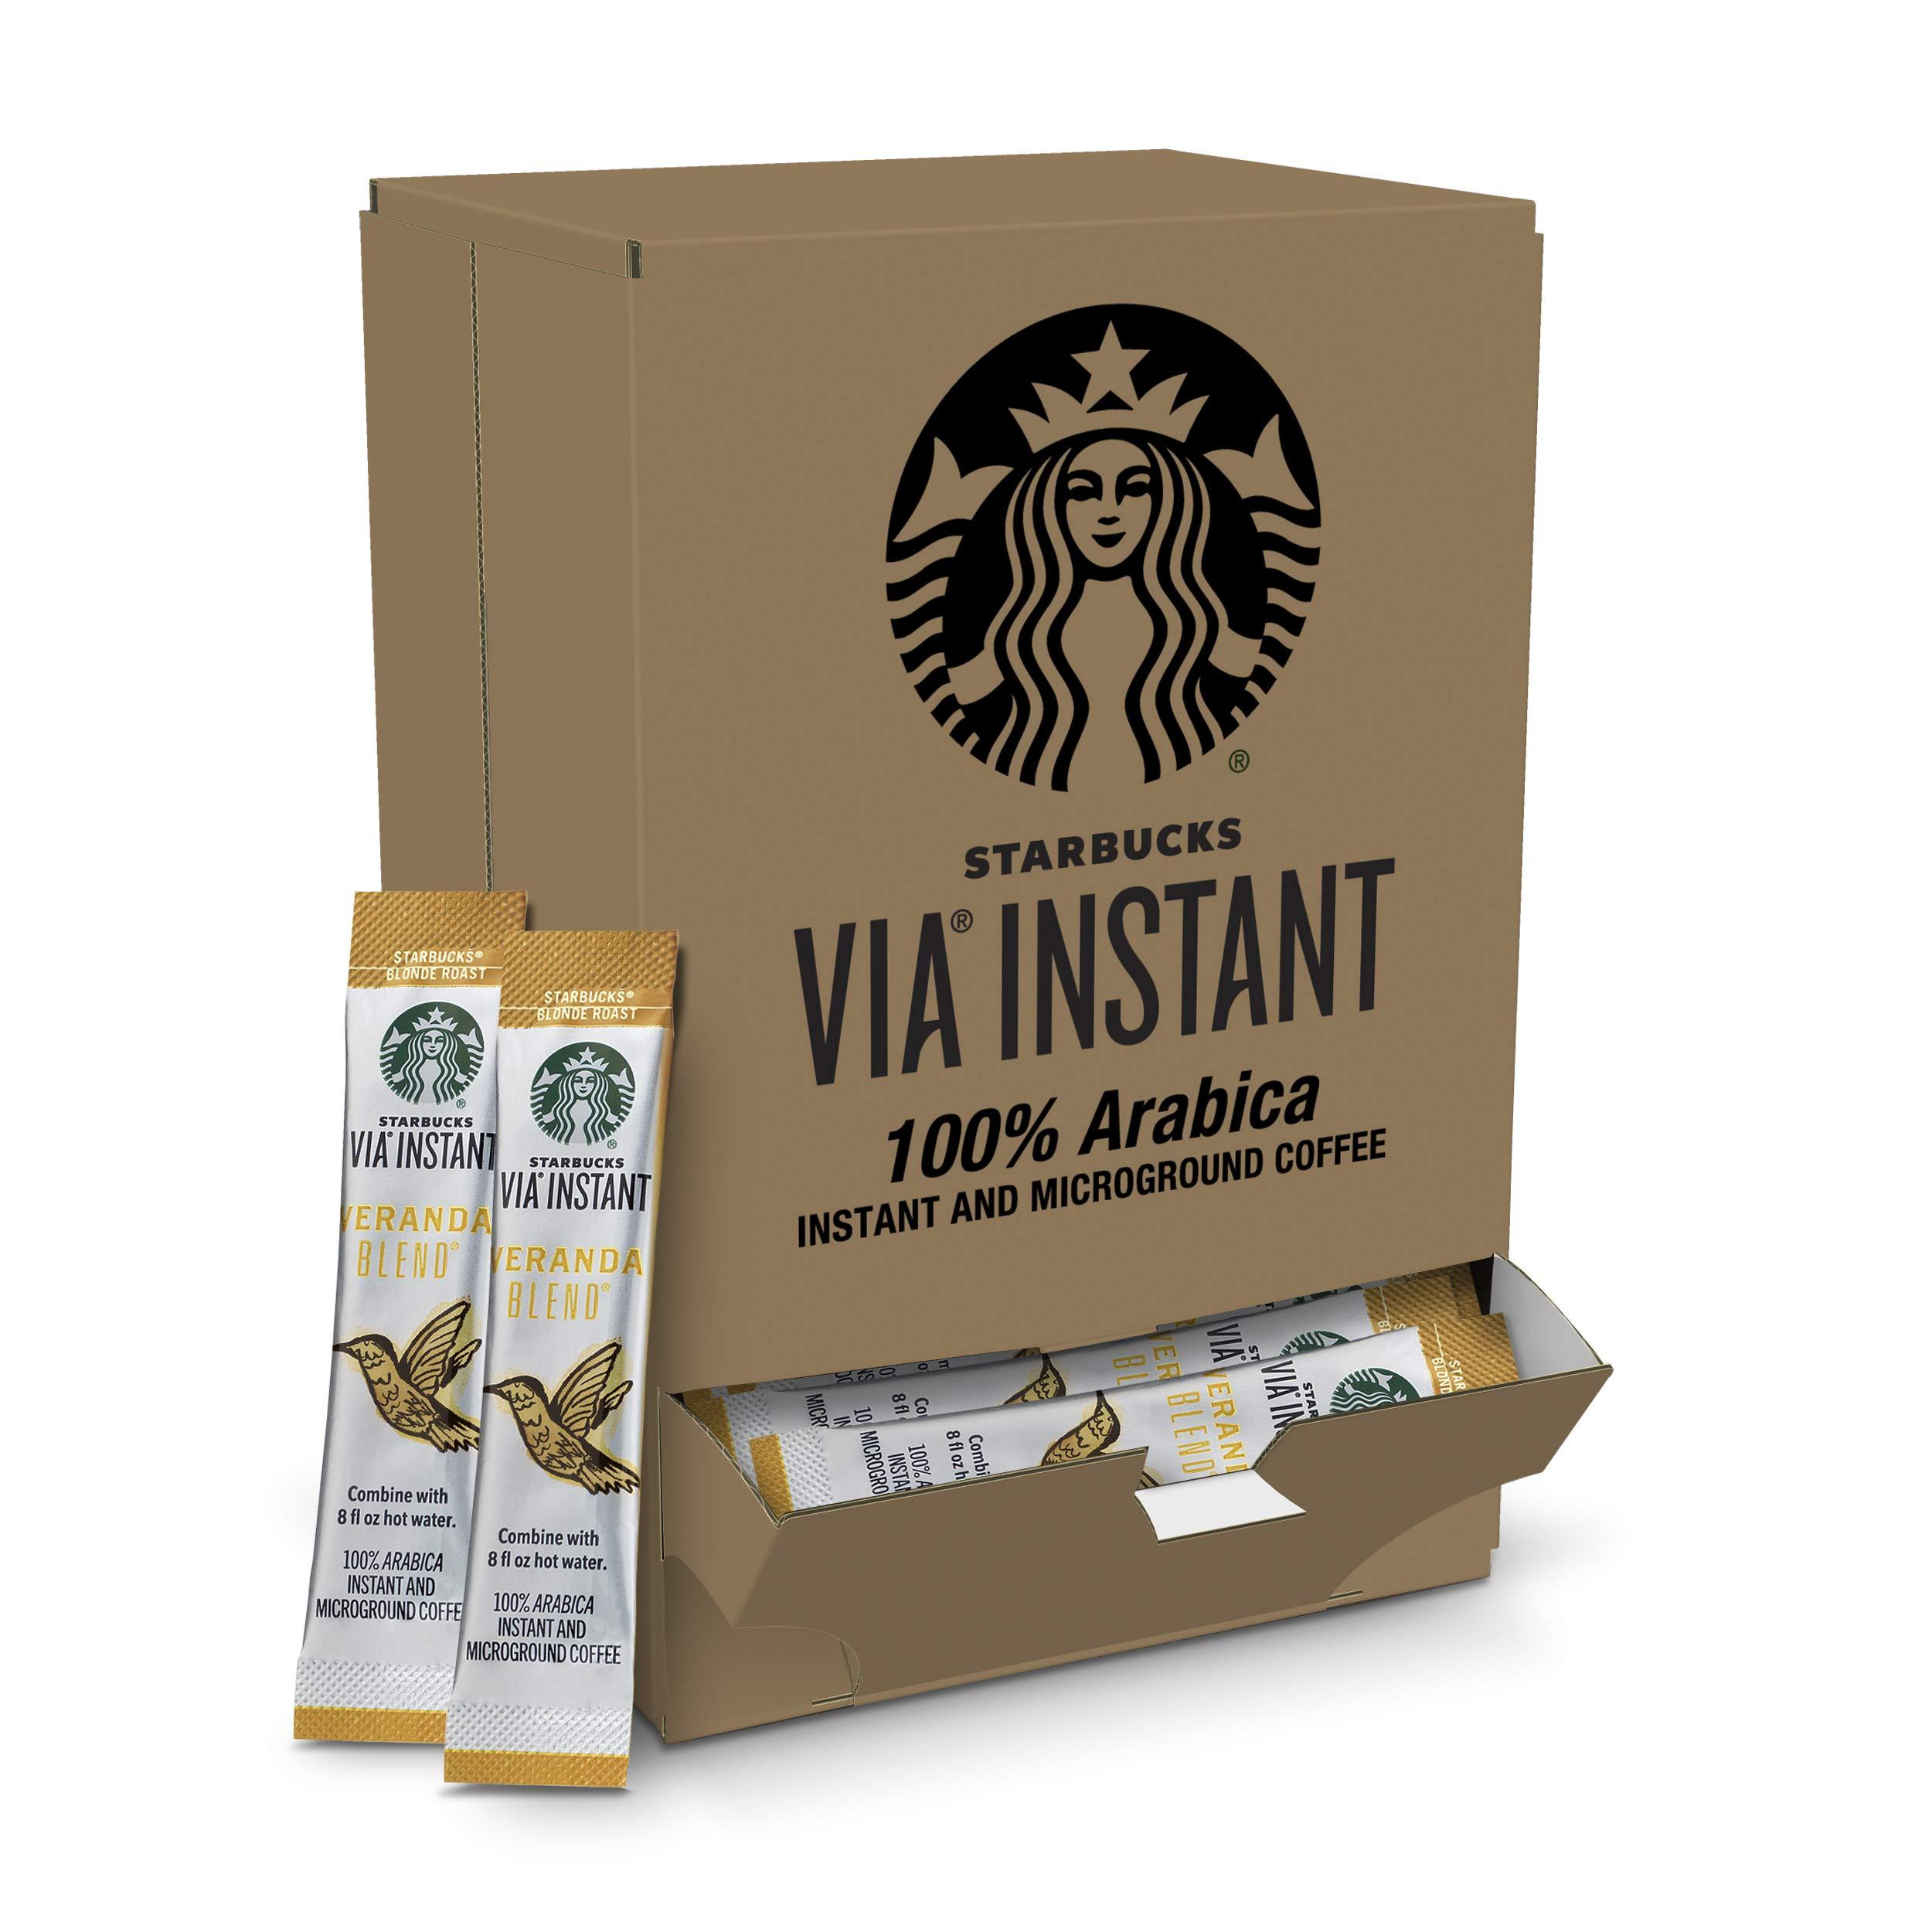 Starbucks VIA Instant Veranda Roast Blonde Roast Coffee (1 box of 50 packets)